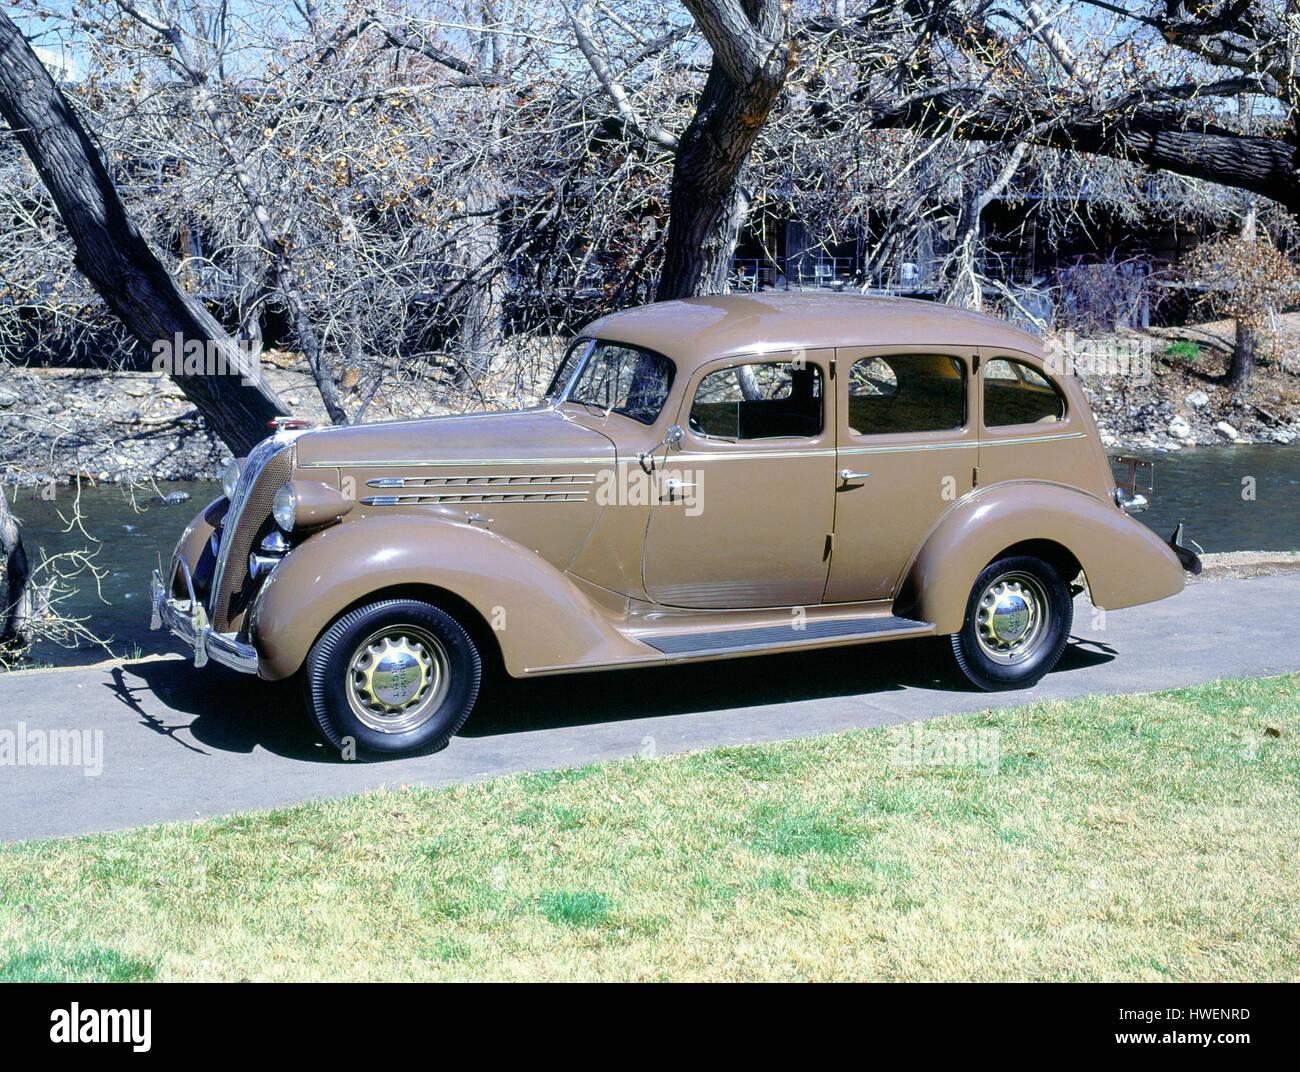 1936 Hudson 64 De Luxe 8 - Stock Image